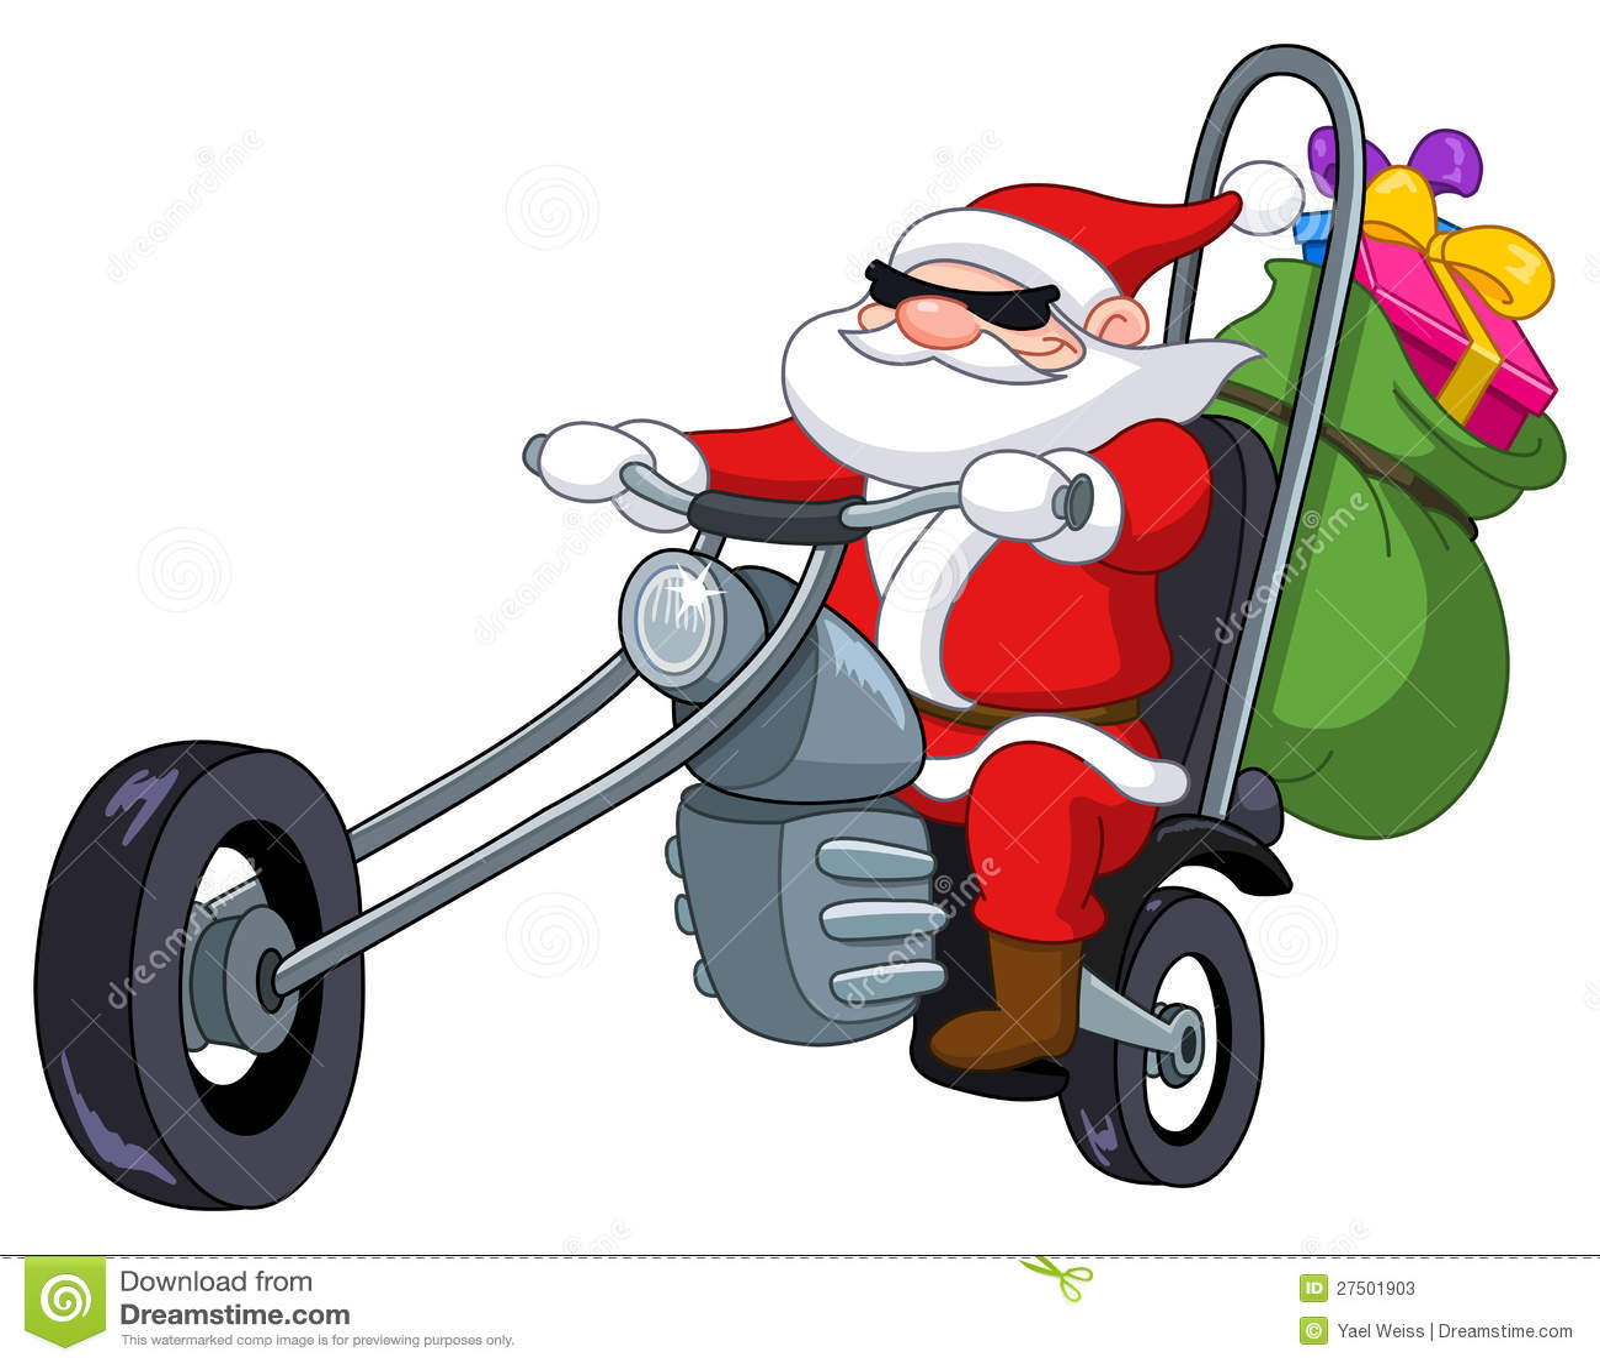 Santa With Motorcycle Stock Photos - Image: 27501903